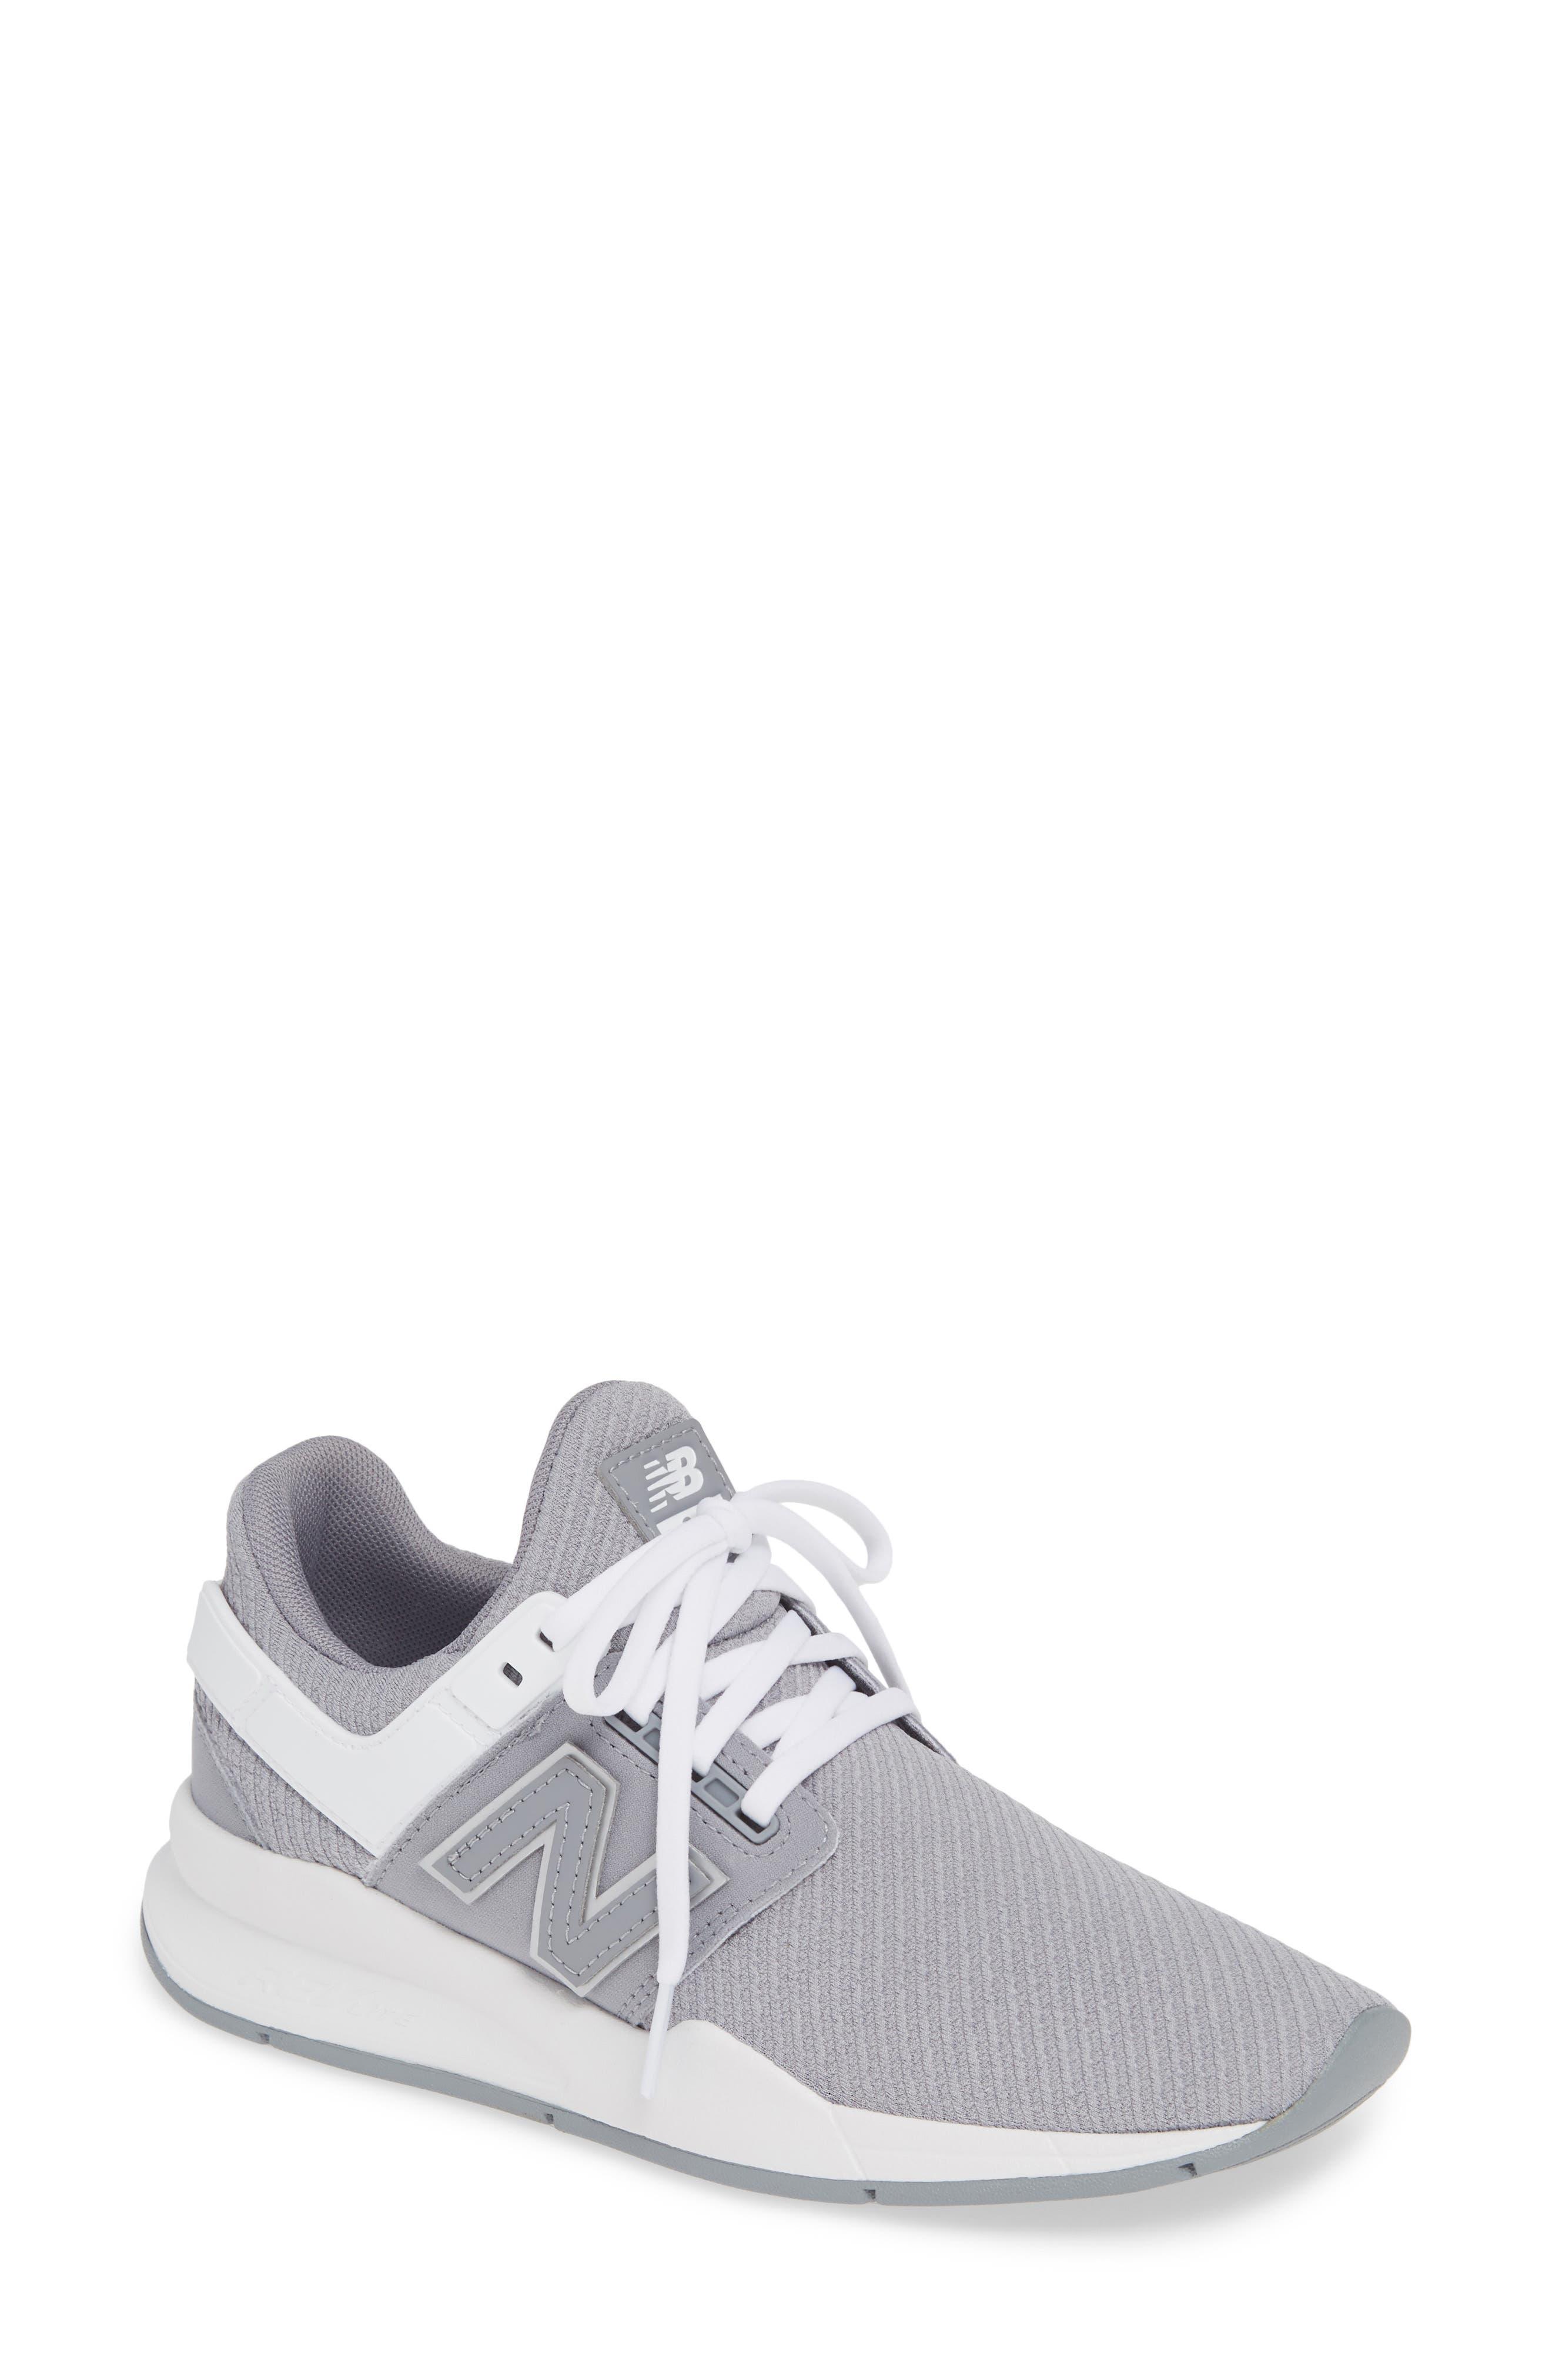 New Balance 247 Sneaker, Grey